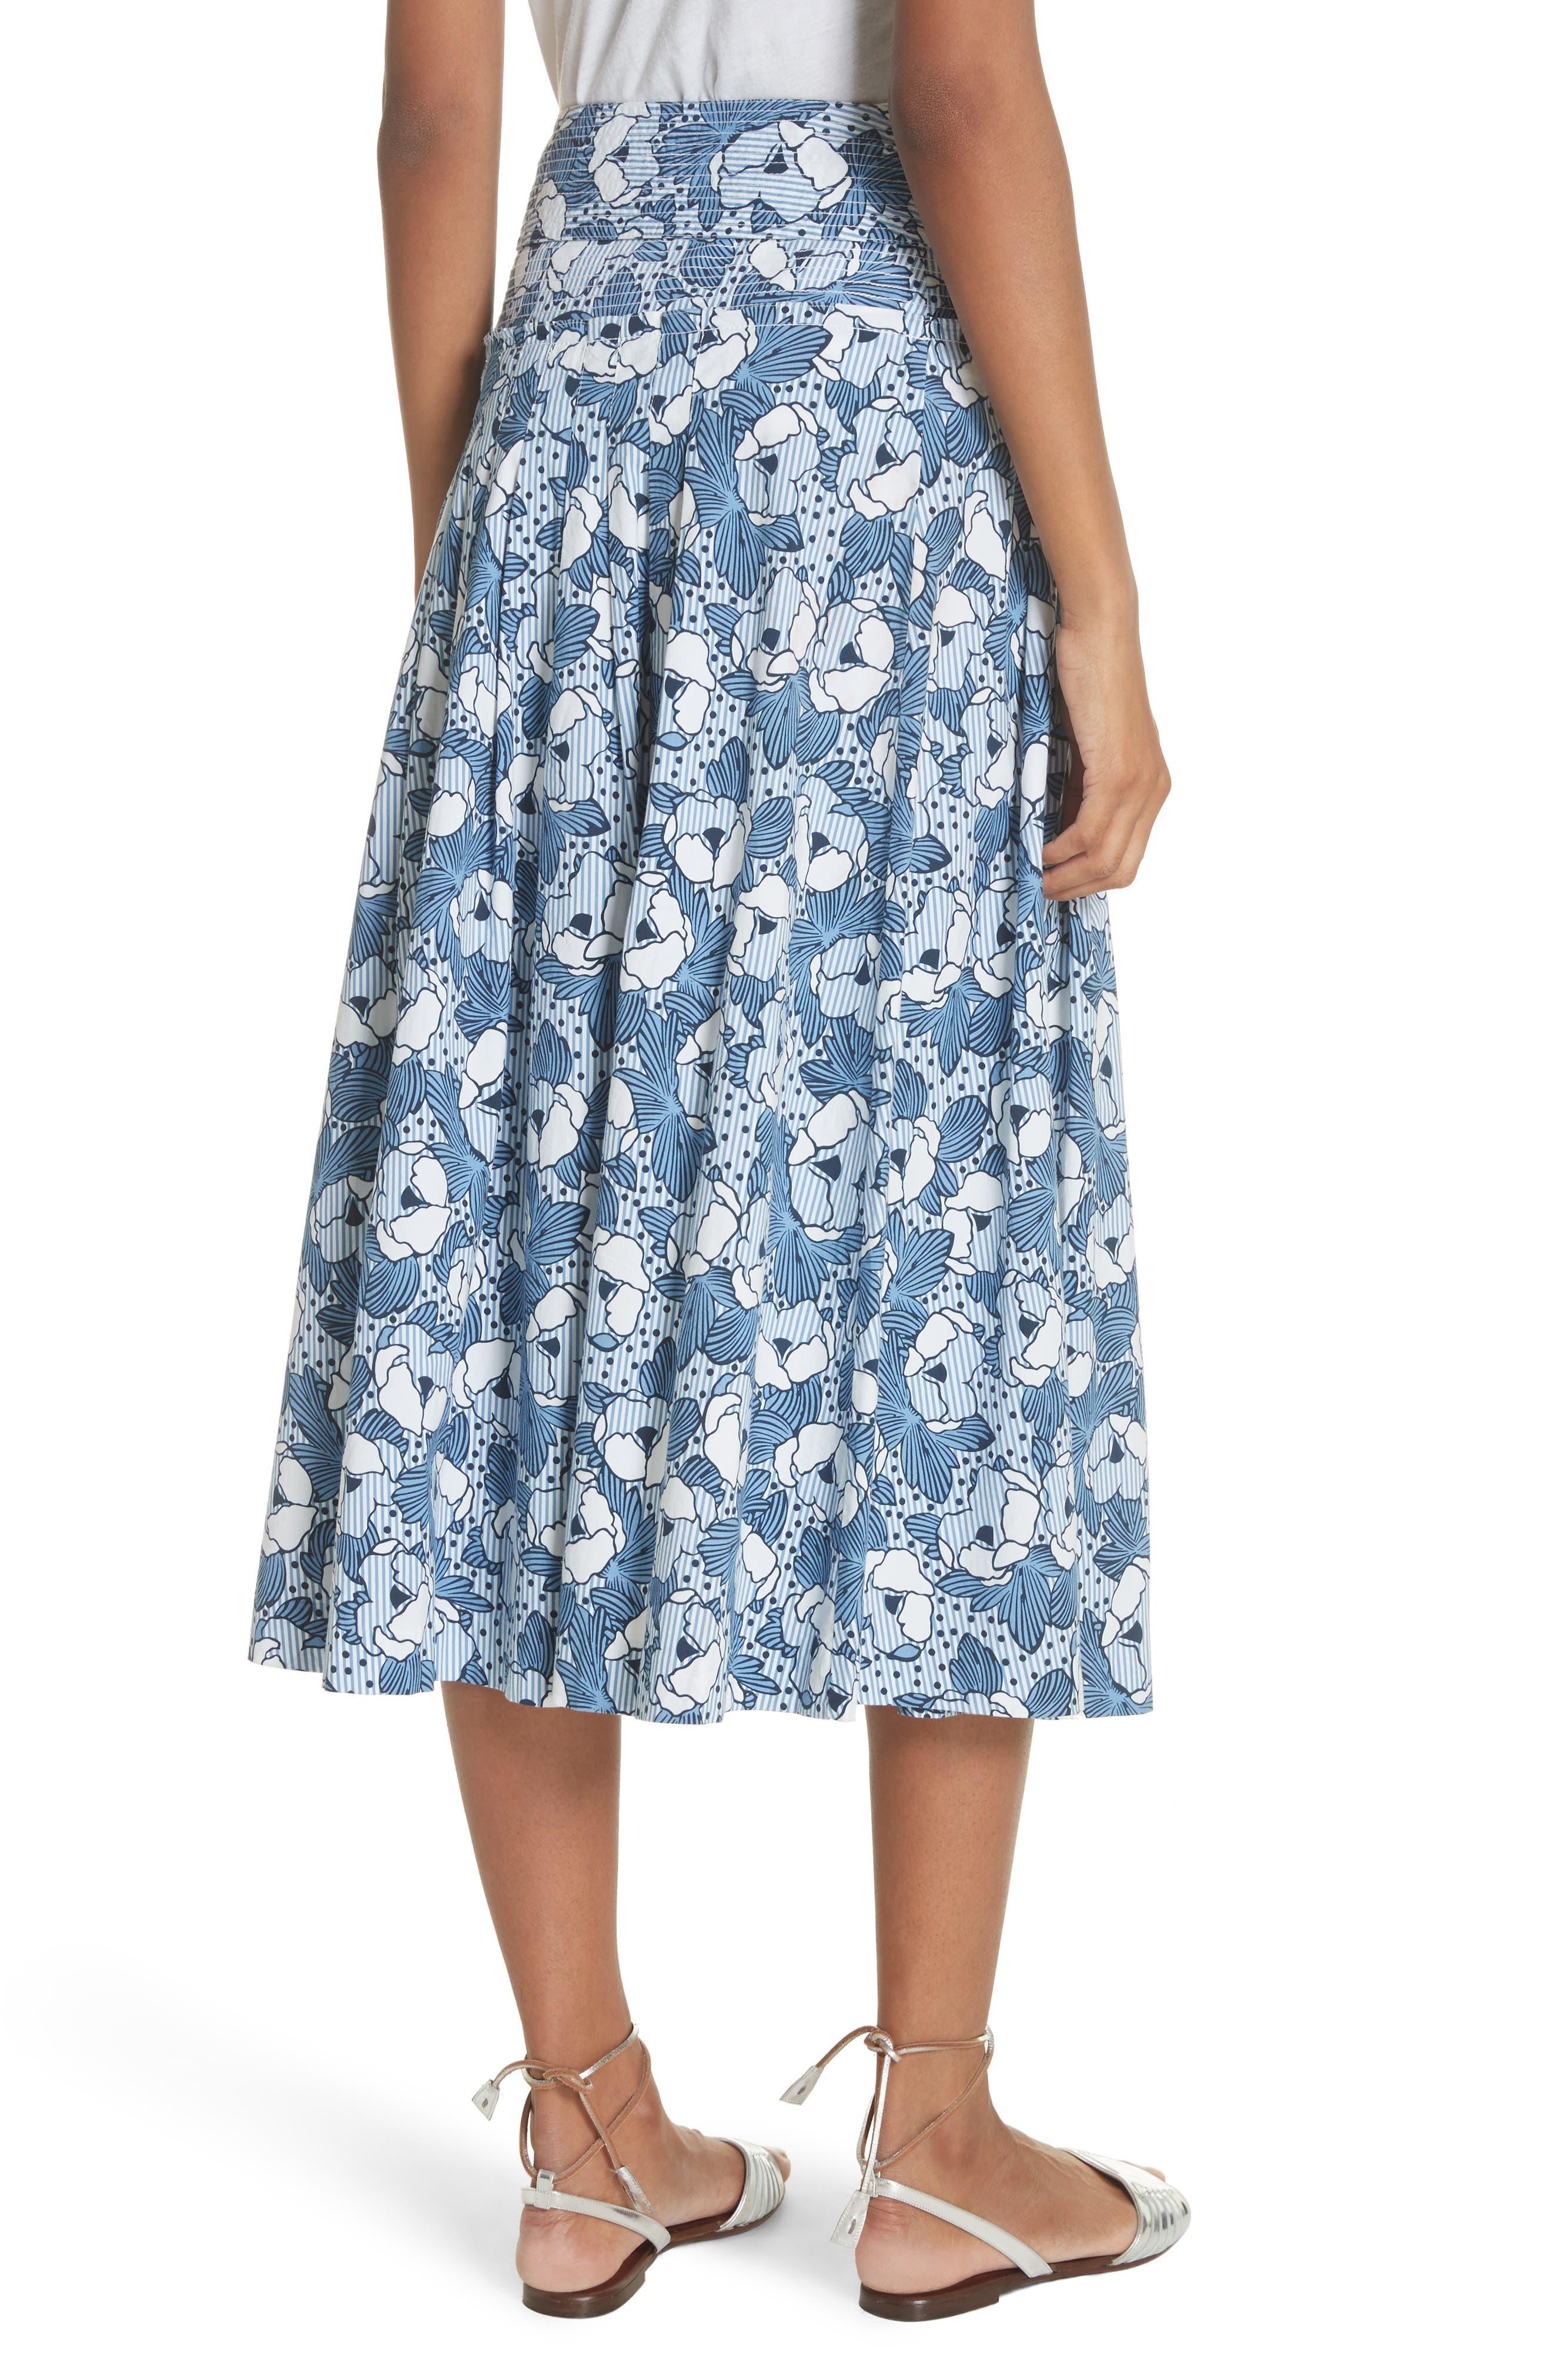 Caralina Floral Print Midi Skirt,                             Alternate thumbnail 2, color,                             Blue/ White